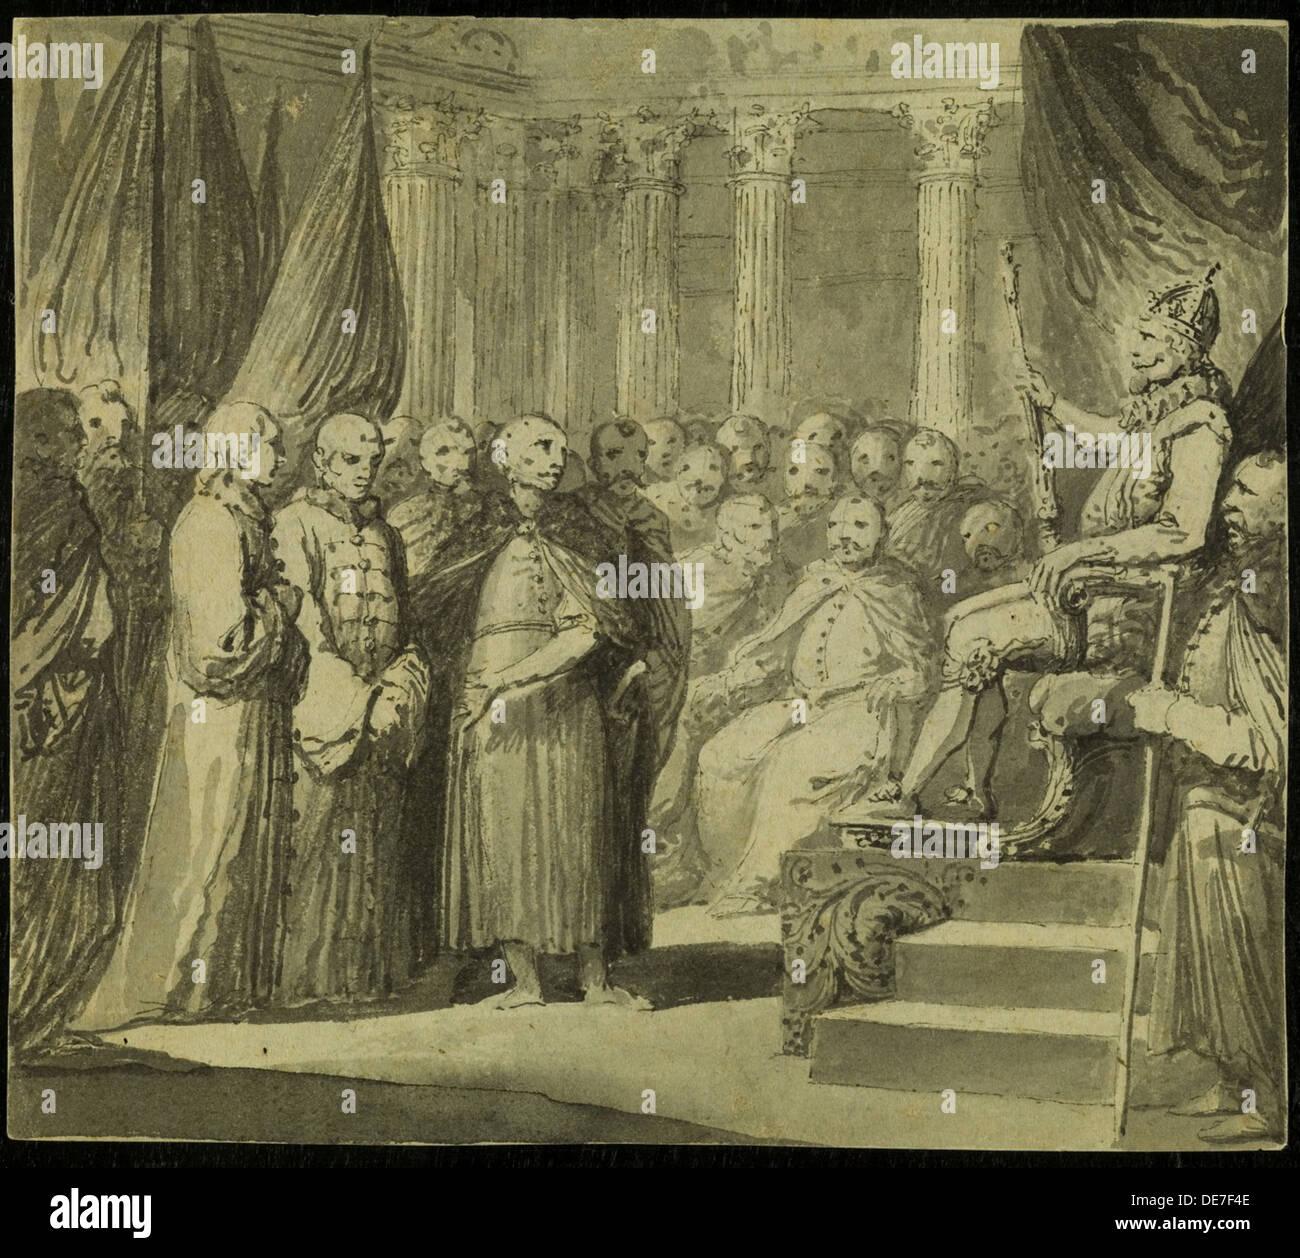 Tsar Vasili IV Ivanovich Shuisky before the King Sigismund III Vasa, Late 18th cent.. Artist: Smuglewicz, Franciszek (1745-1807) - Stock Image